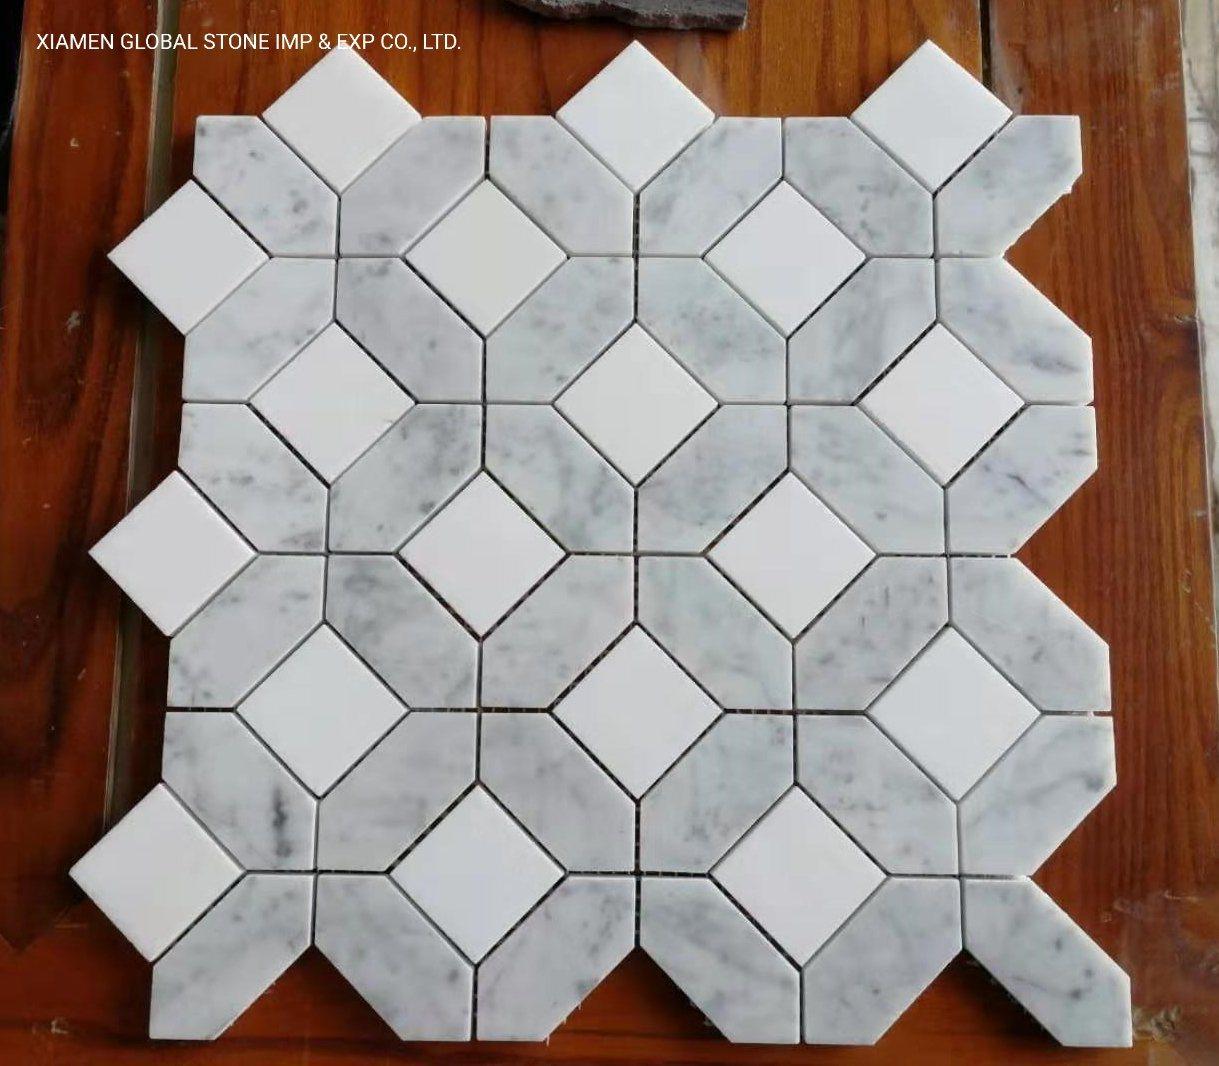 China Carrara Thassos White Marble Square Hexagon Shape Mosaic Tiles Wall Backsplash Panels Photos Pictures Made In China Com